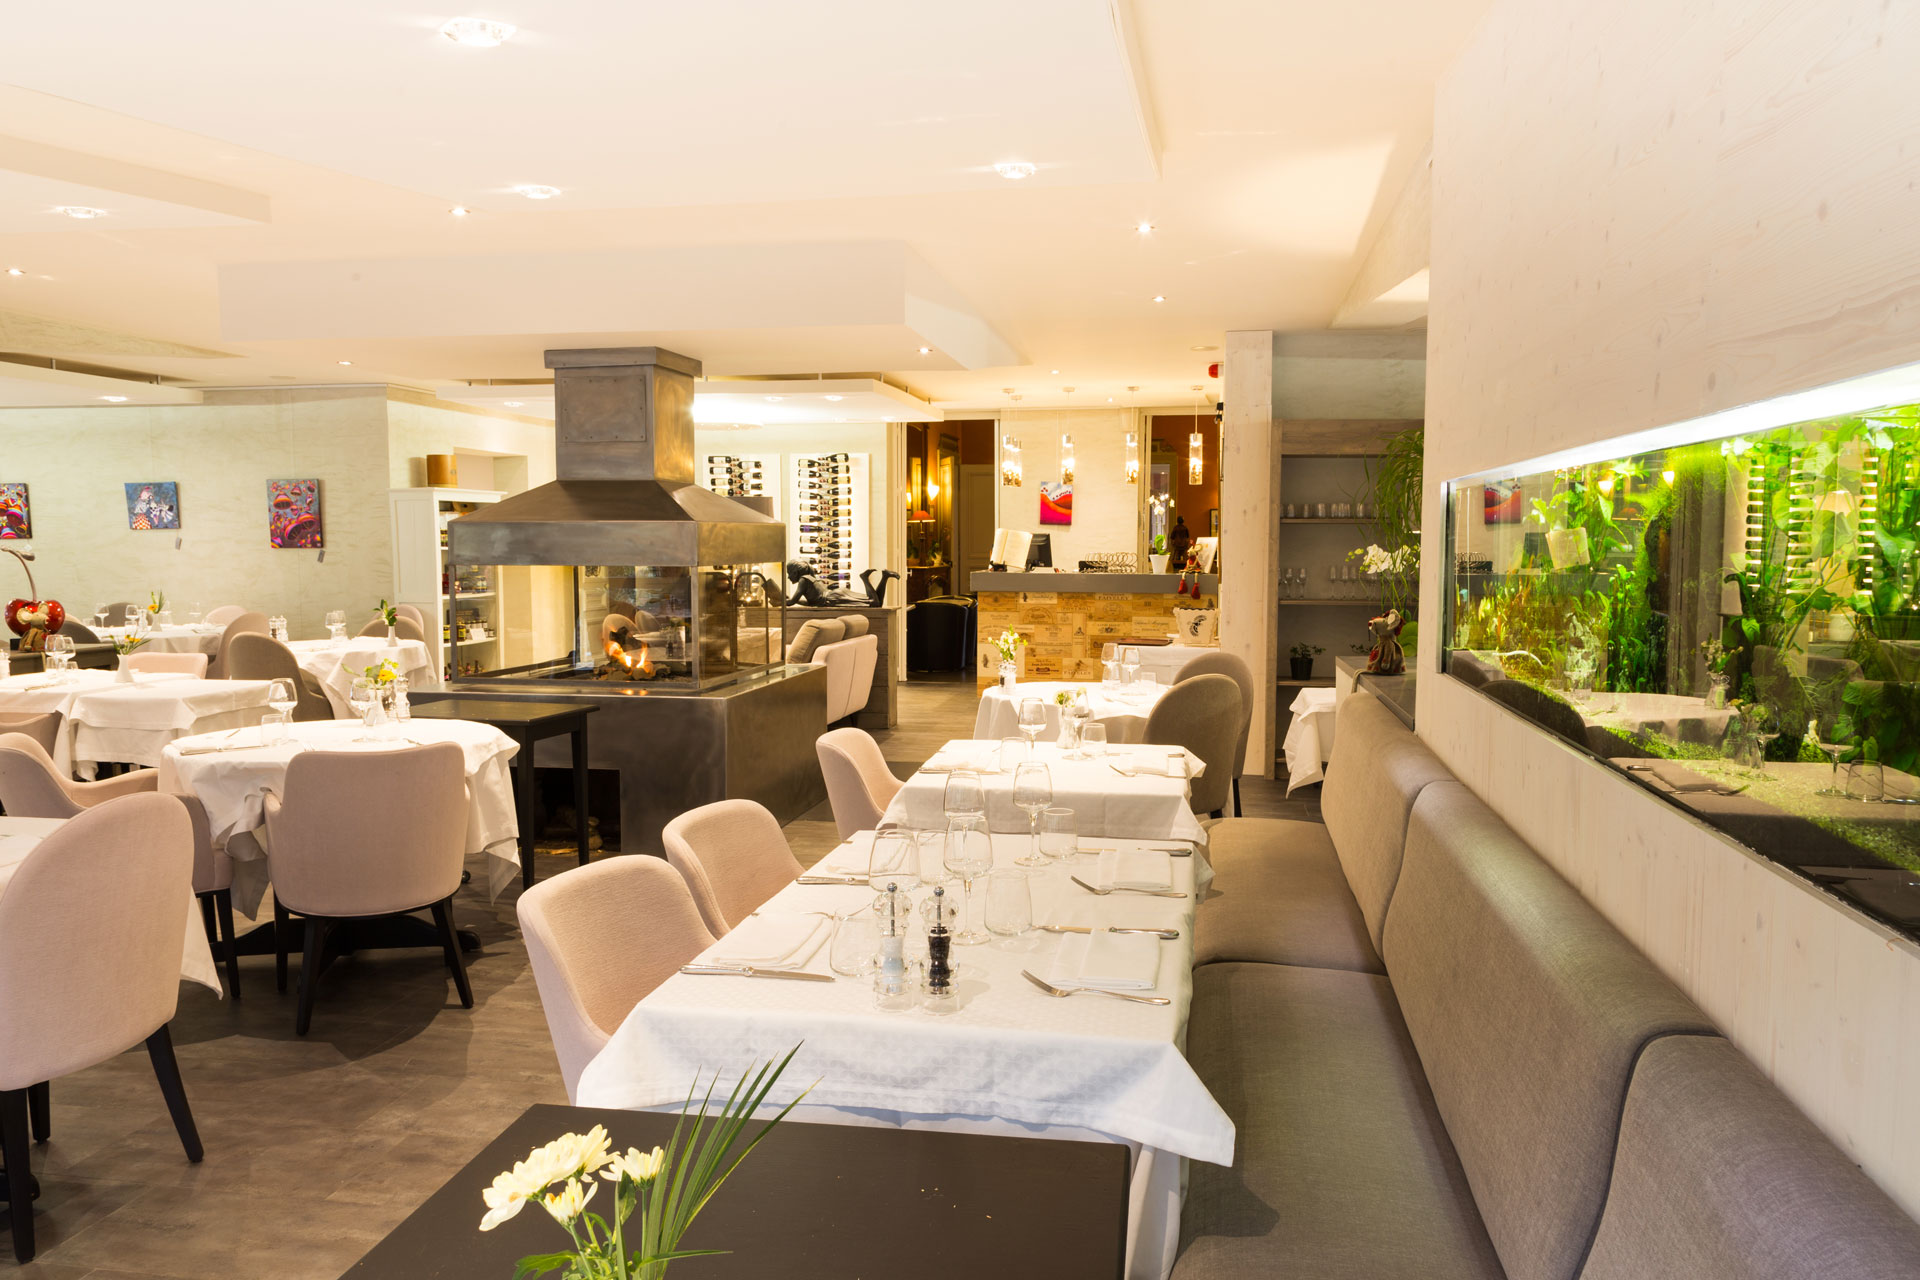 Le Restaurant - La R U00e9sidence